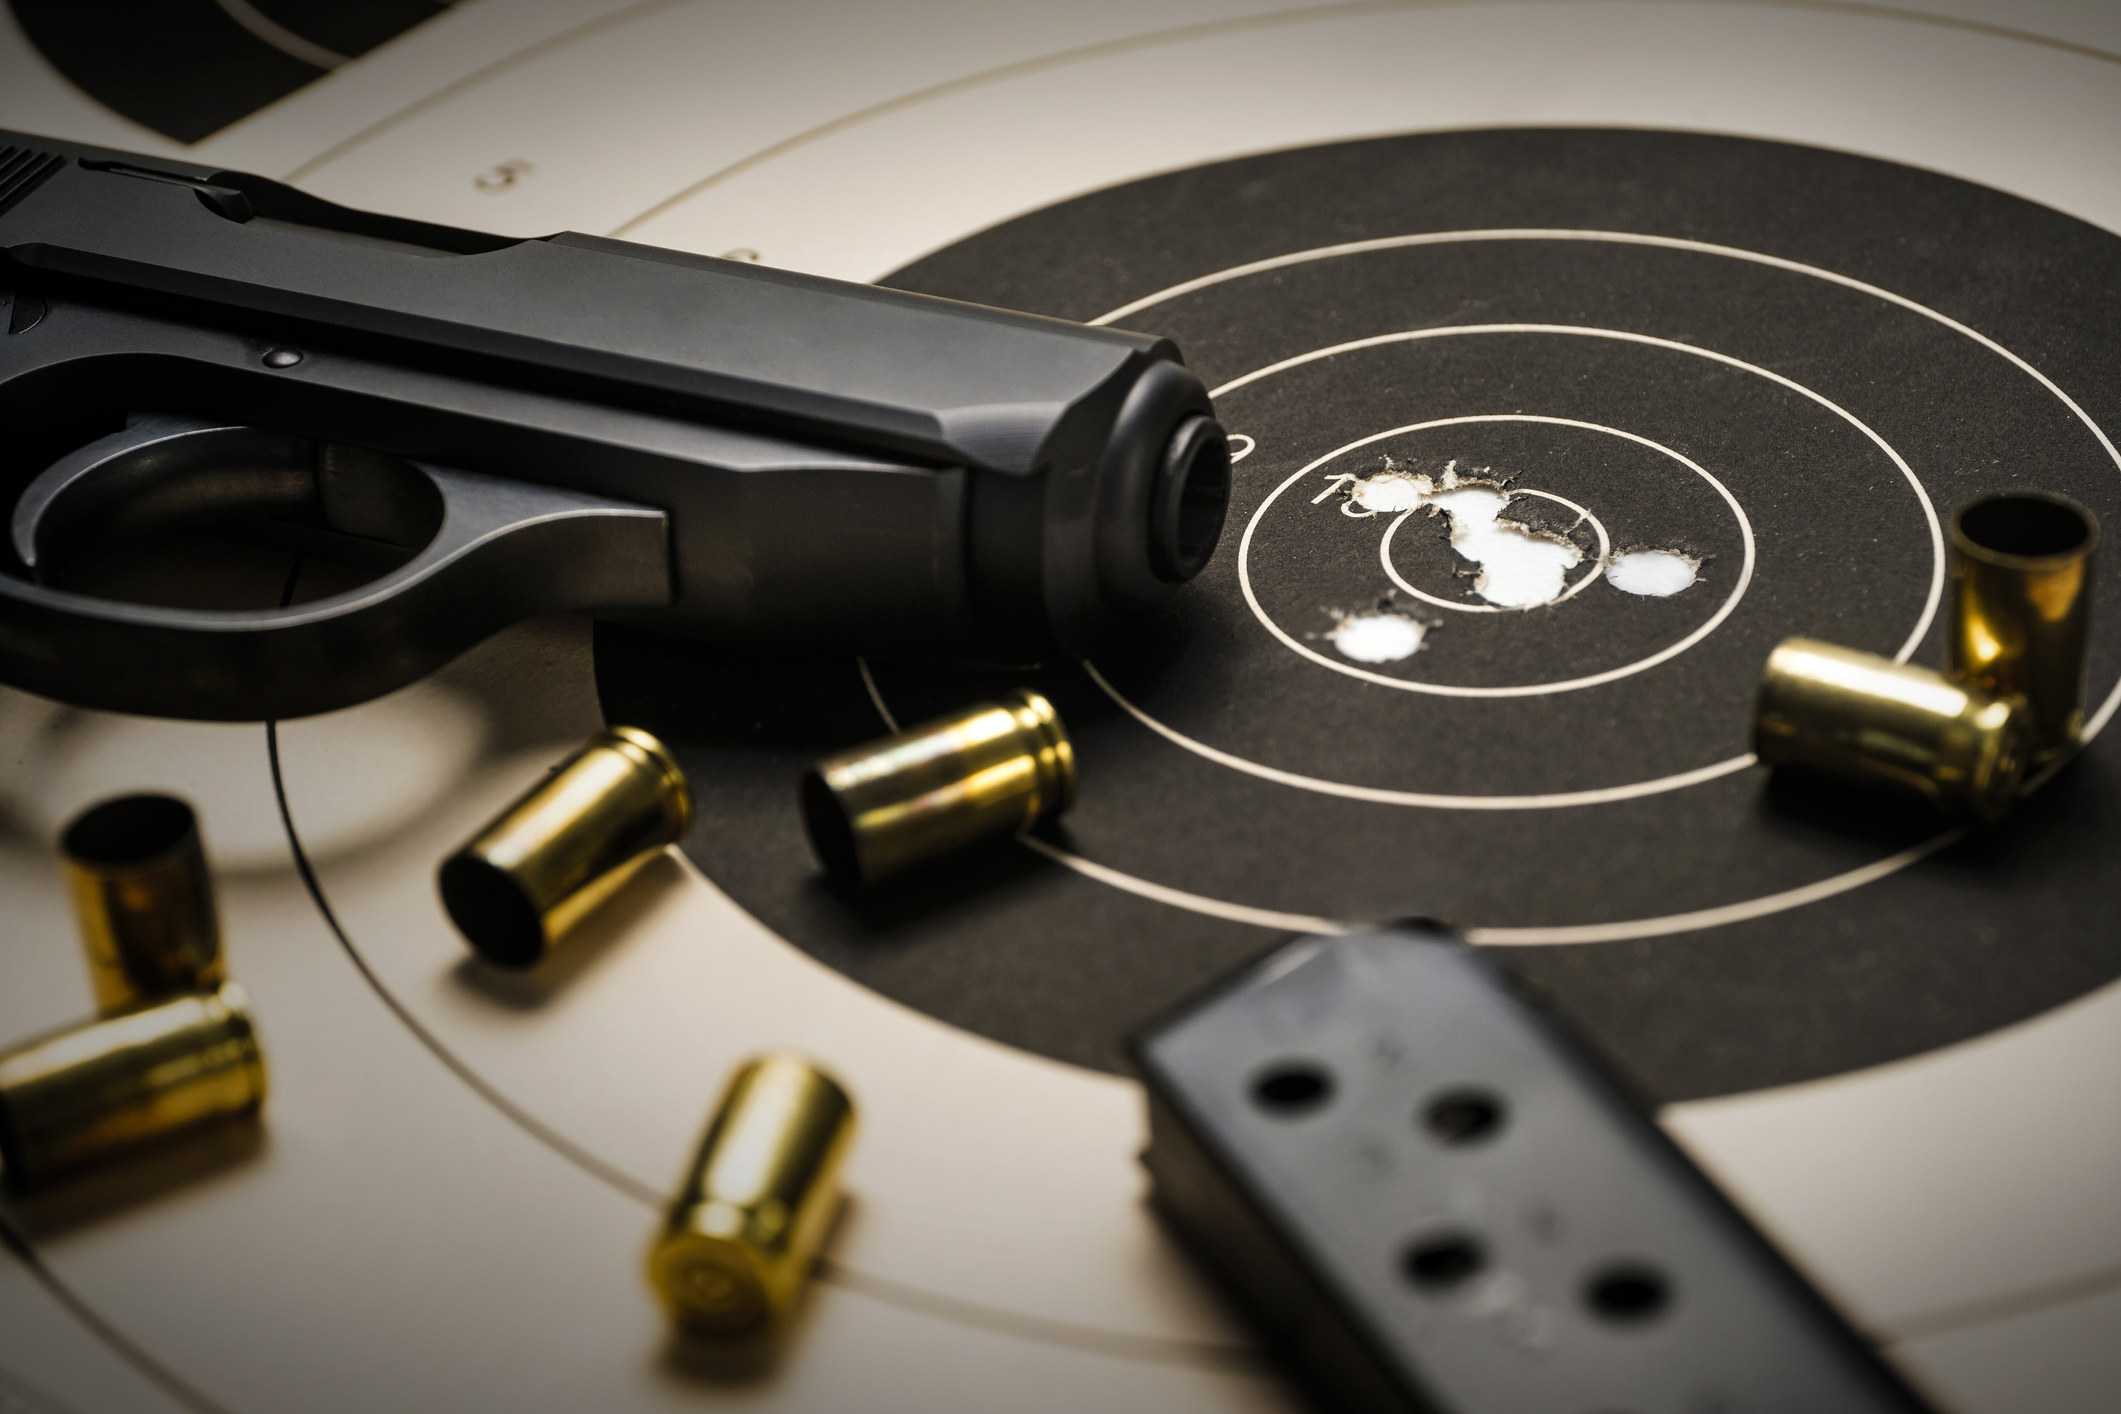 a gun and bullets